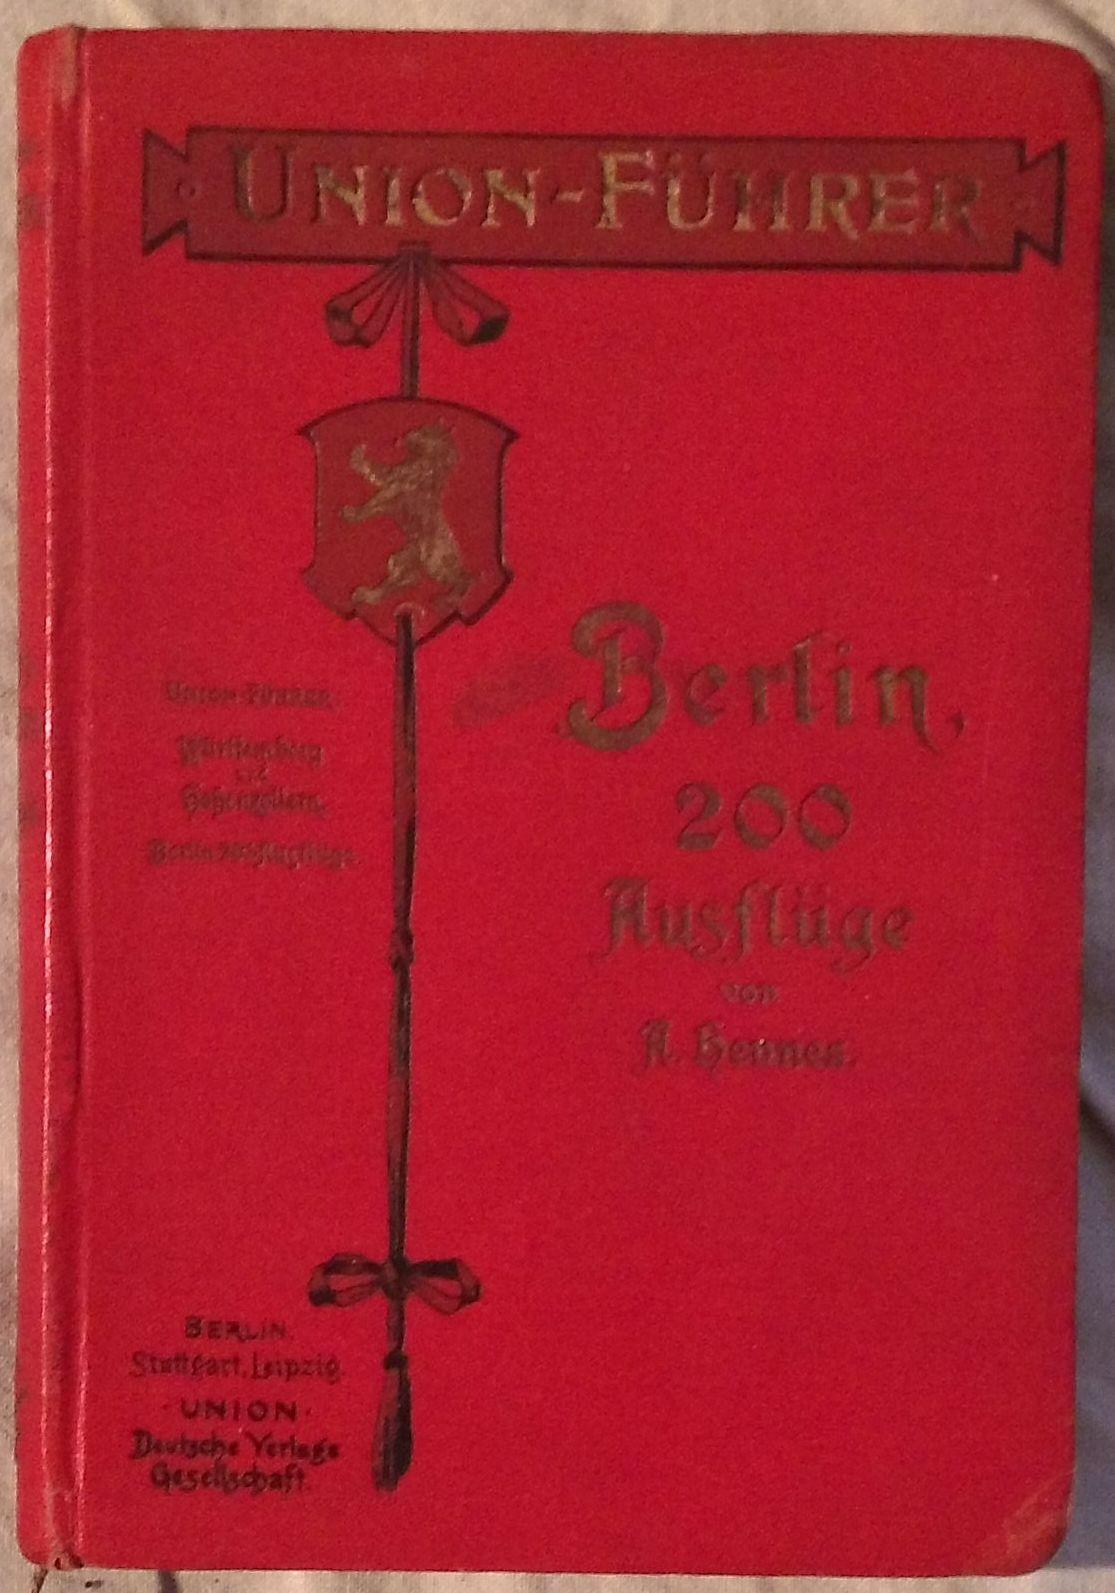 200 Ausflüge in die Umgebung von Berlin.: Hennes, Aloys